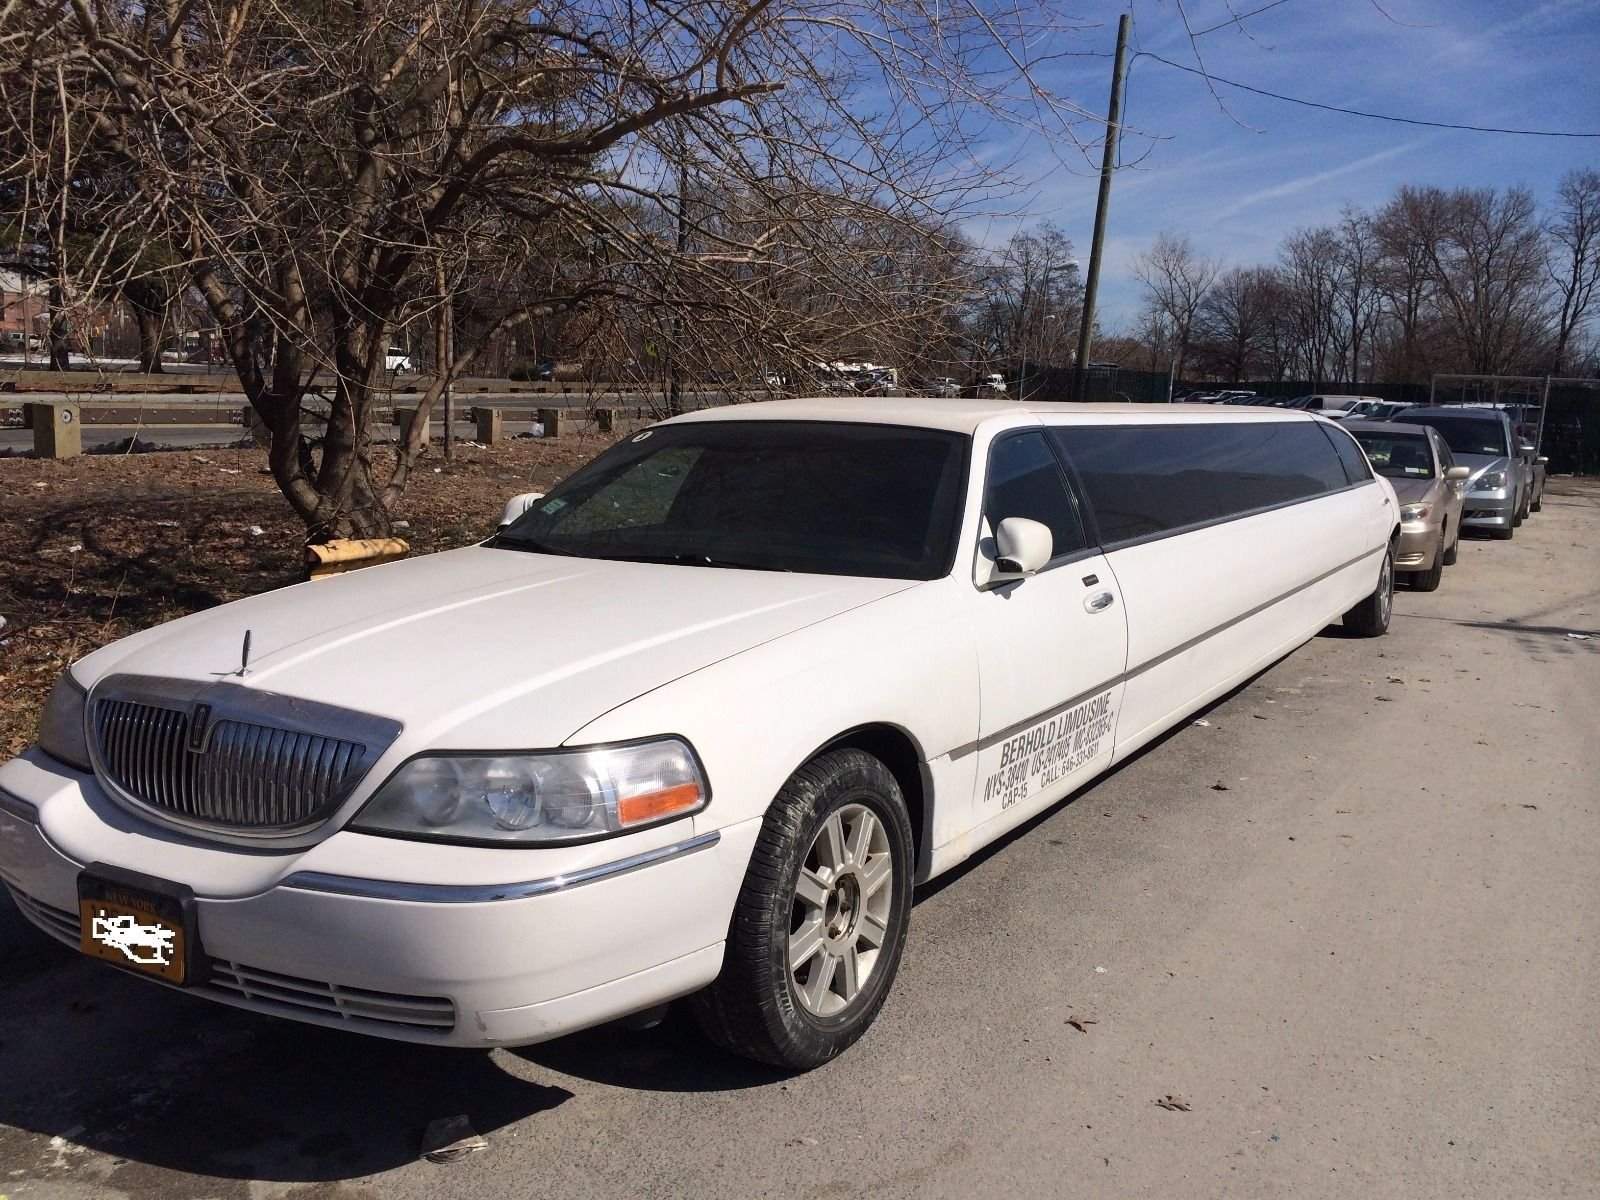 2007 Lincoln Town Car Executive Limousine 5 Door Limousines For